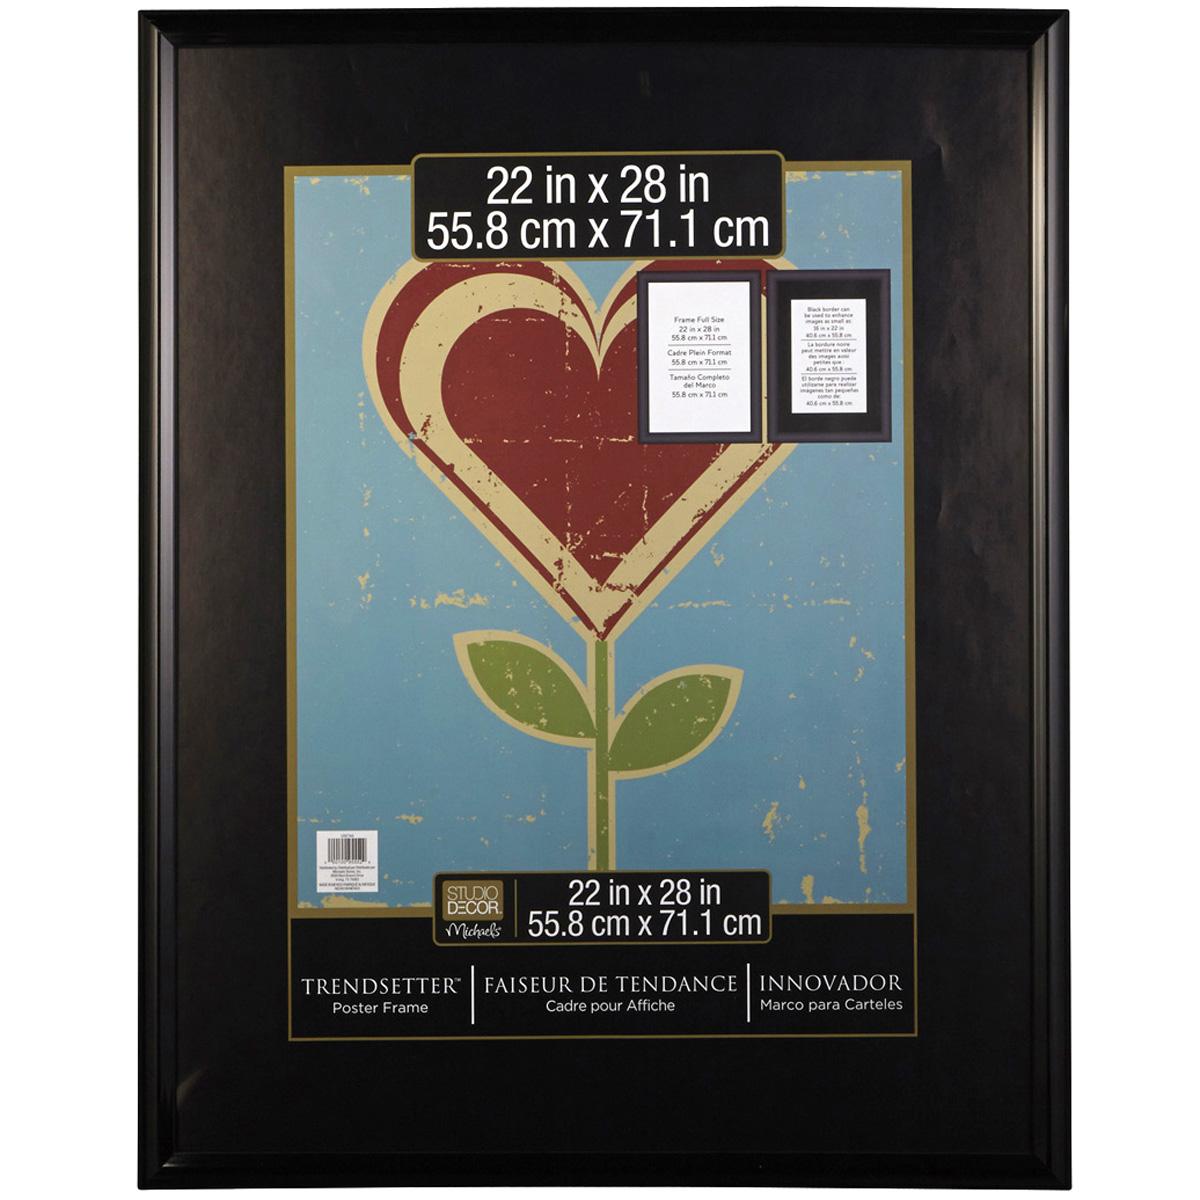 Poster frame michaels